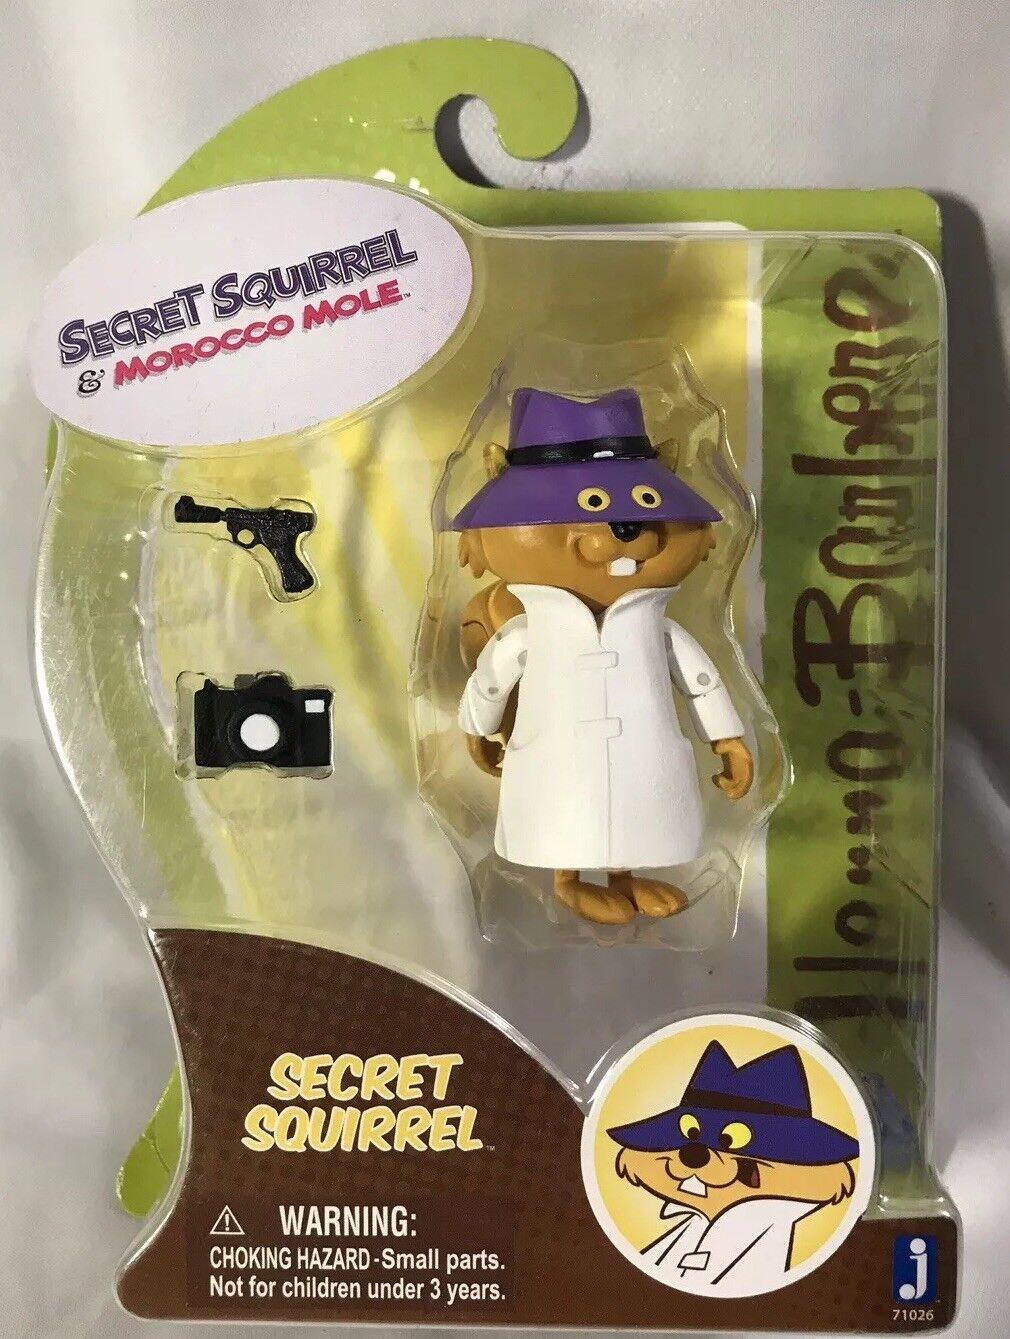 Hanna-Barbera Secret Squirrel & Mgoldcco Mole Secret Squirrel 3-Inch Figure